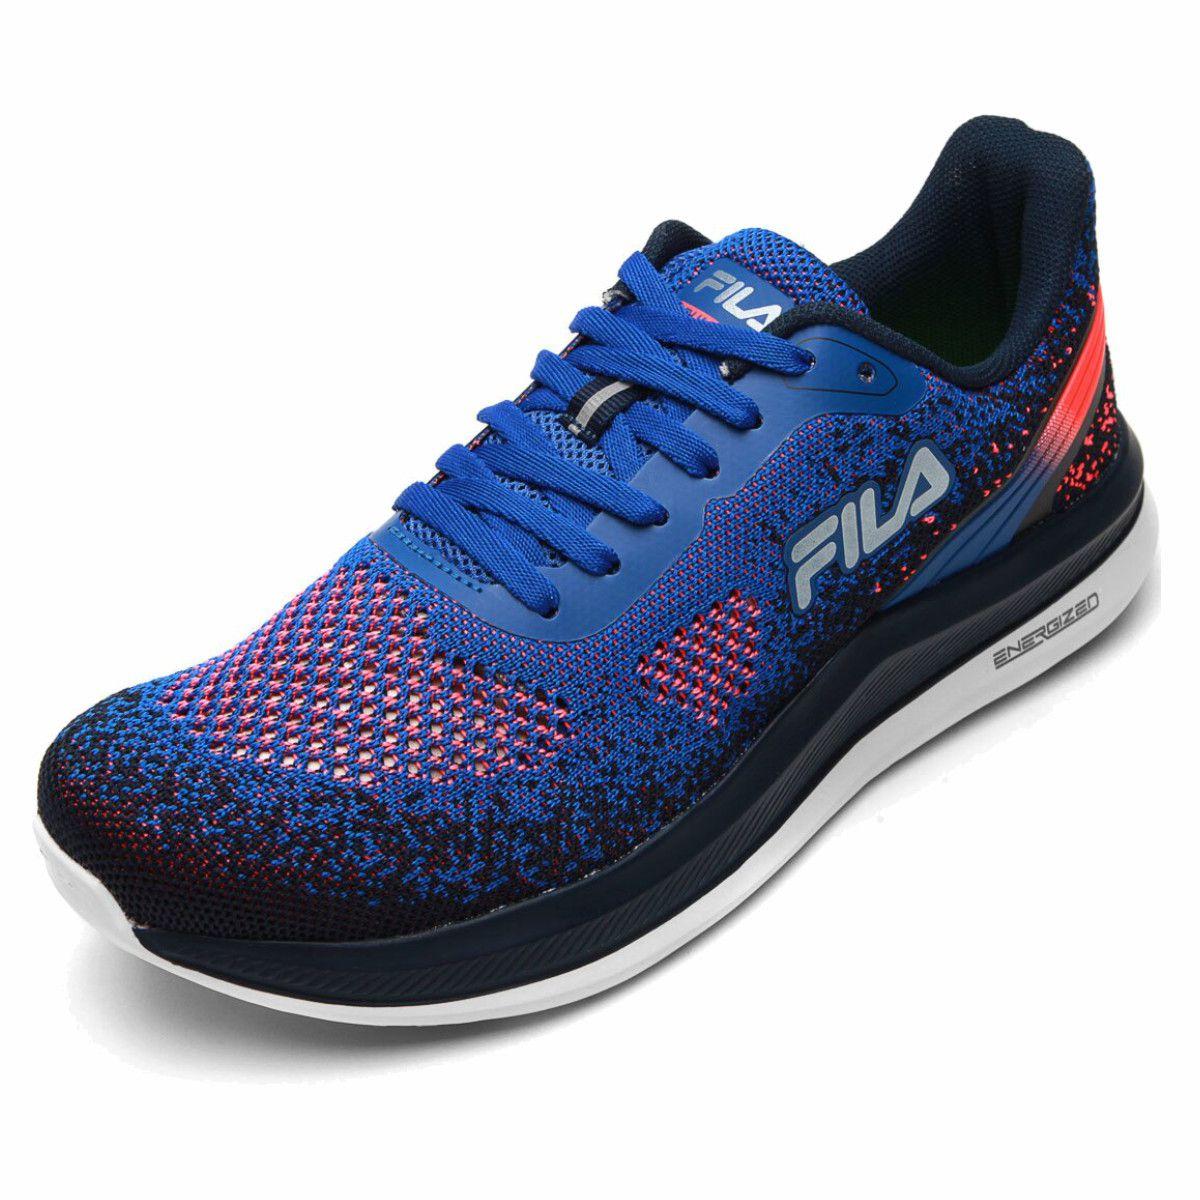 Tenis Fila FR Lumix Energized Running Masculino Azul